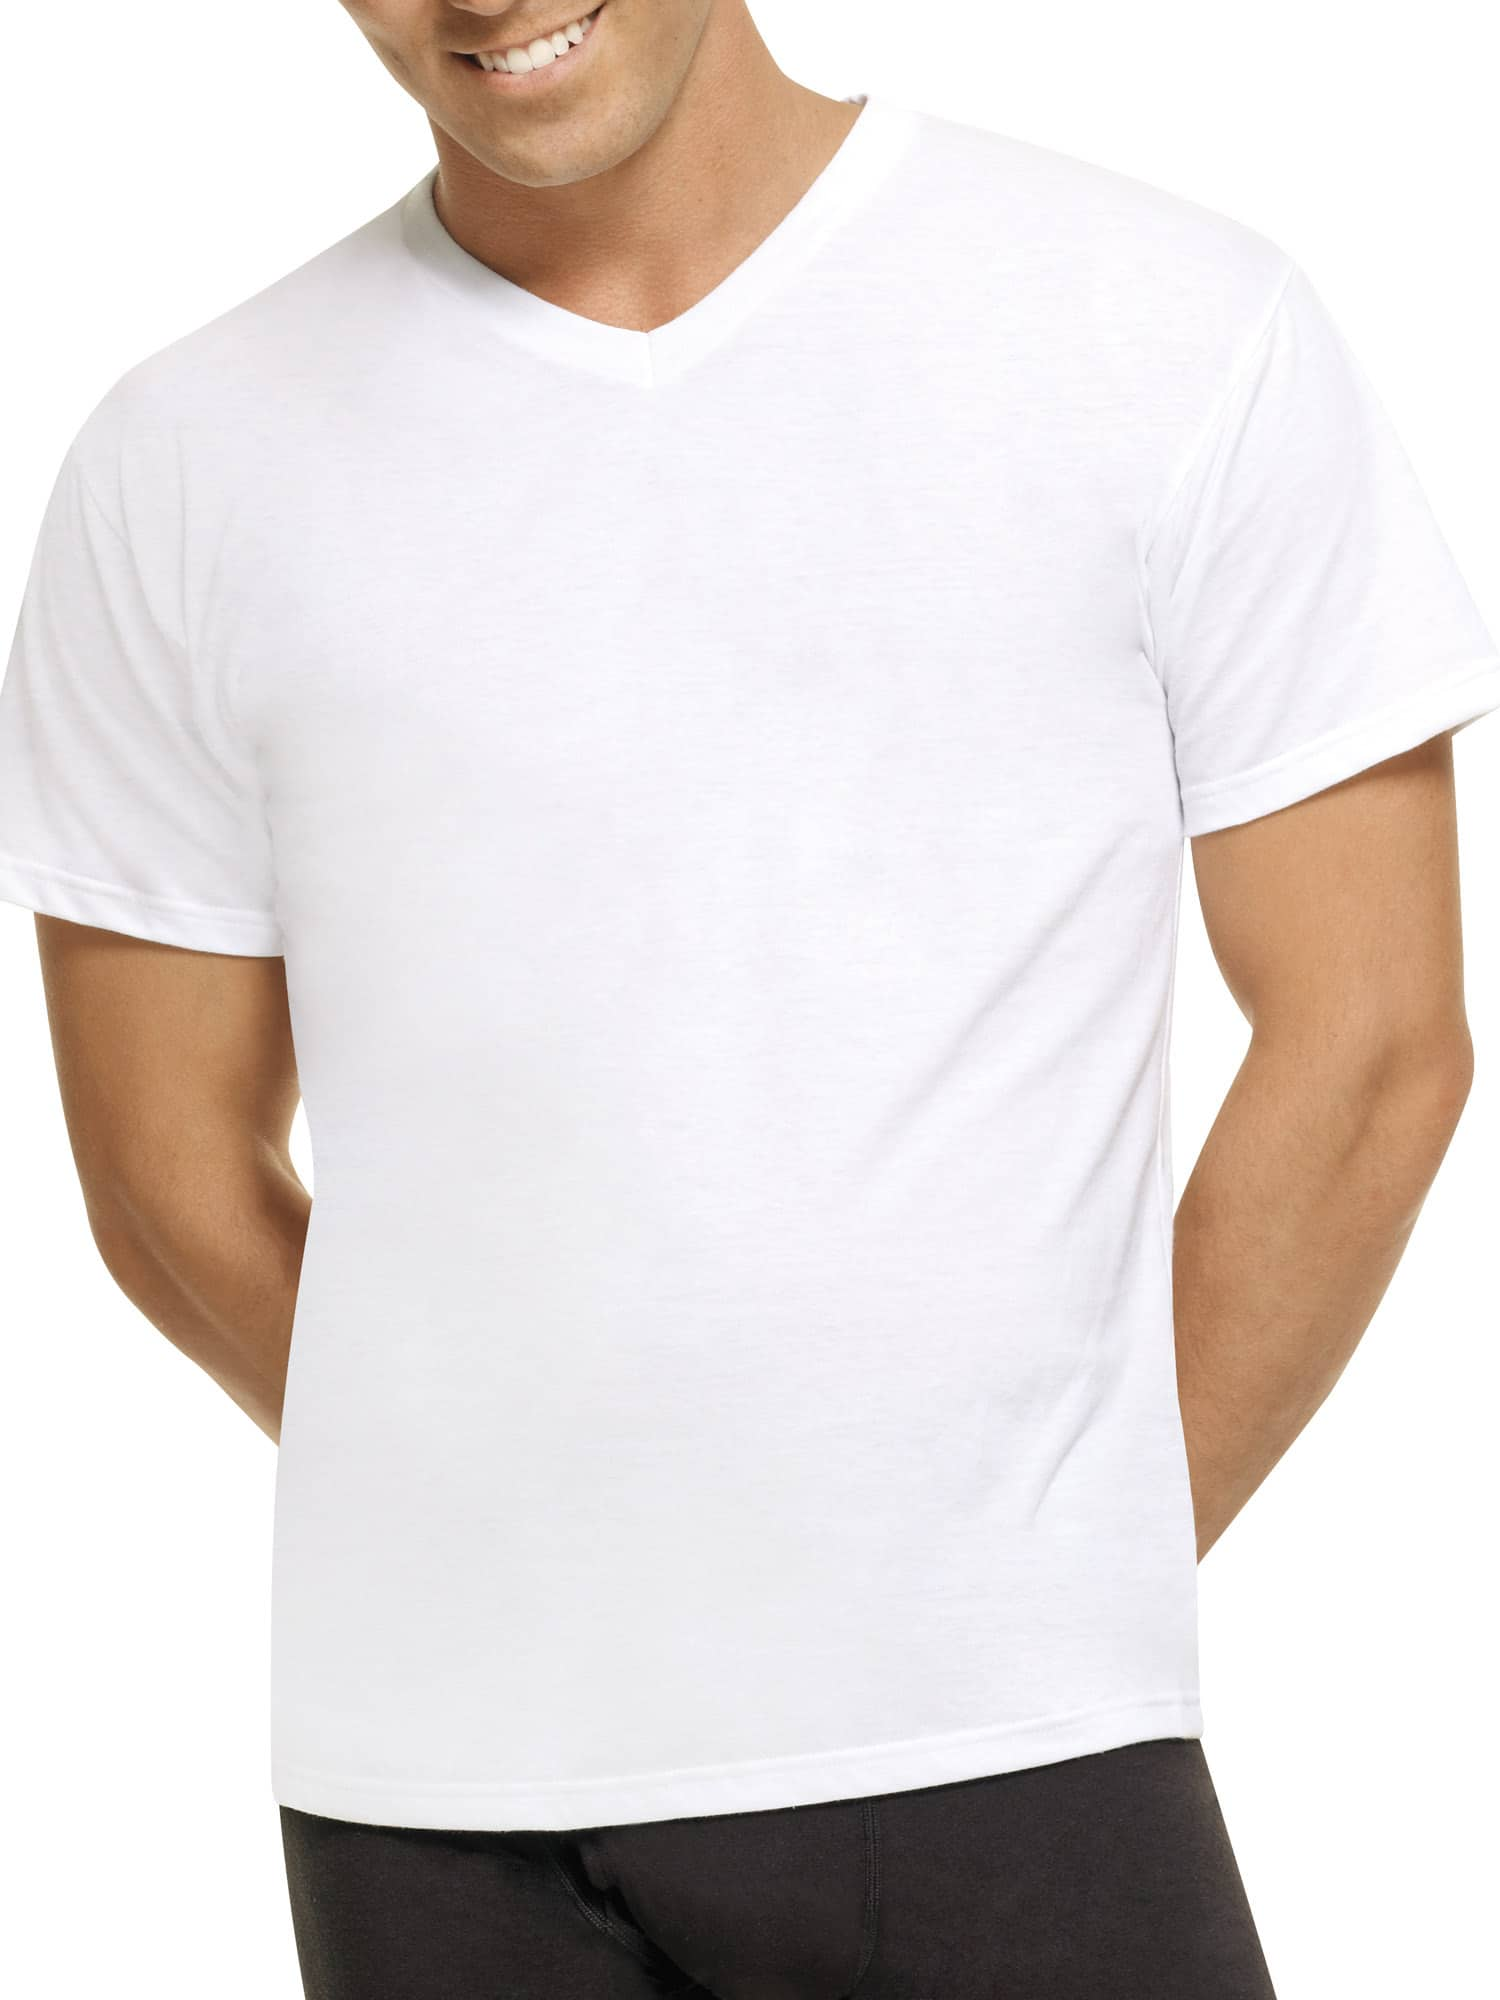 5-Pack Hanes Mens ComfortBlend White V-Neck T-Shirts $7